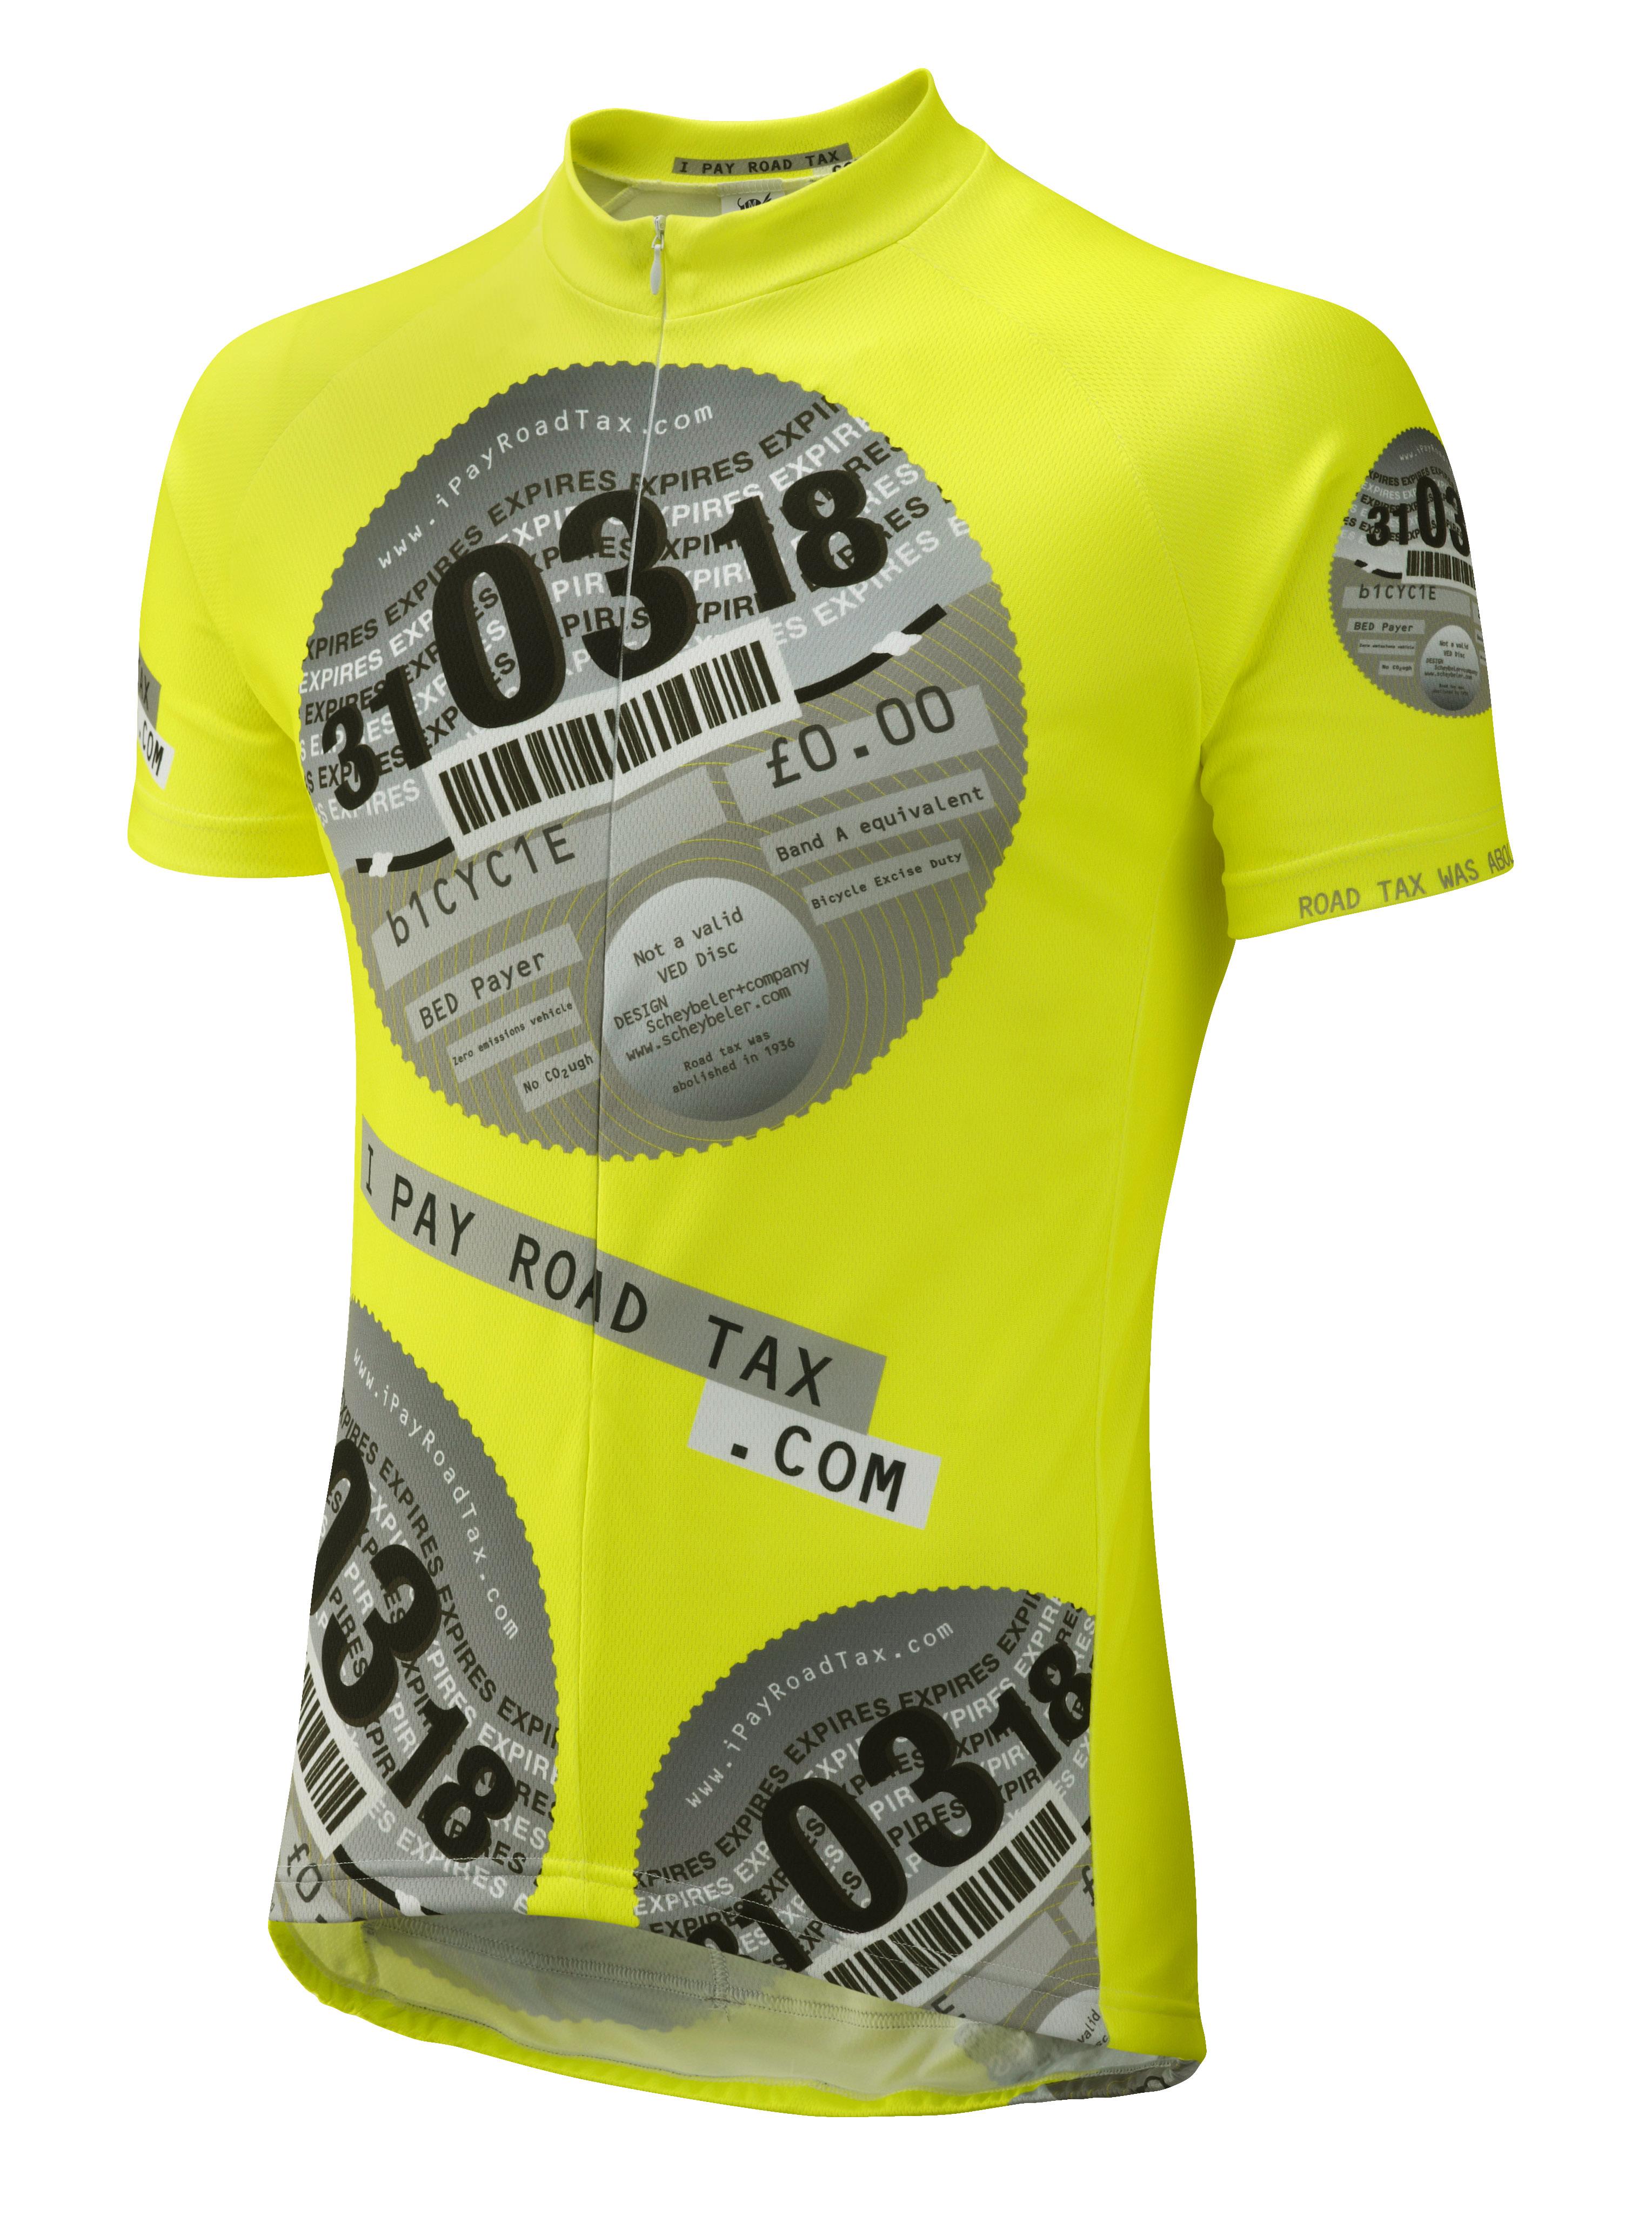 ef06f2a3e iPayRoadTax Road Cycling Jersey - Front Black iPayRoadTax Fluro Yellow ...